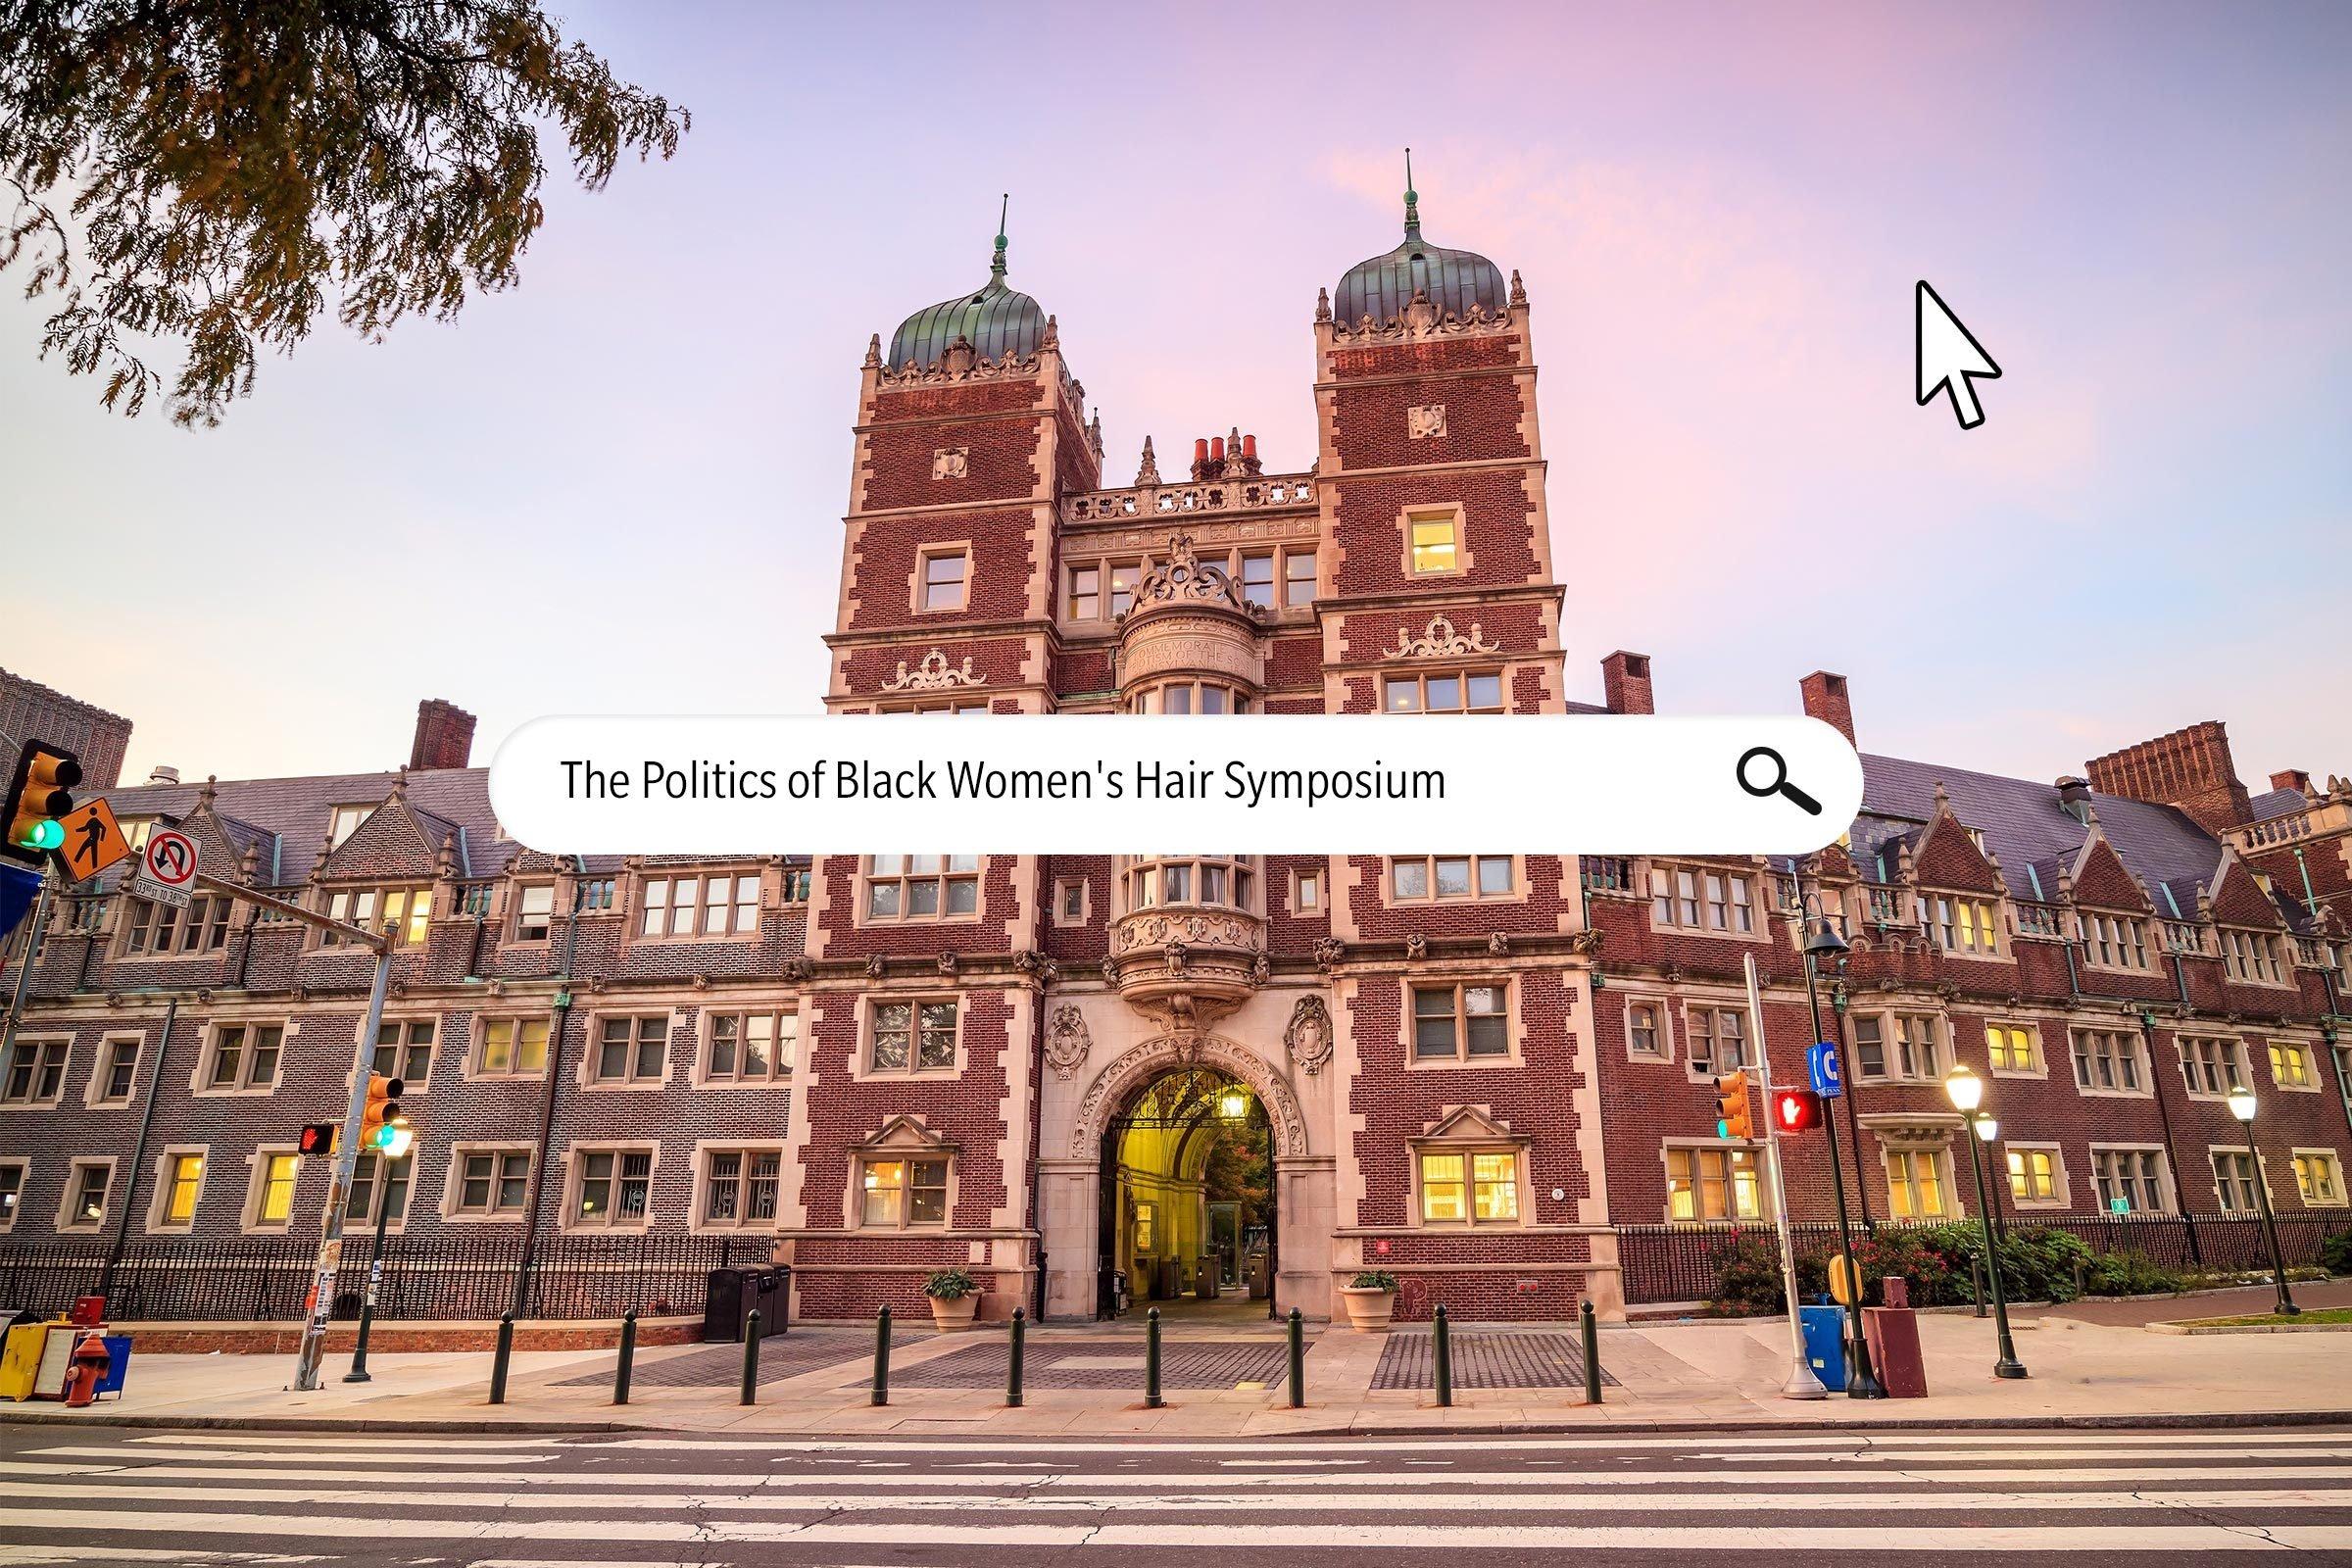 The Politics of Black Women's Hair Symposium (University of Pennsylvania Center for Africana Studies)